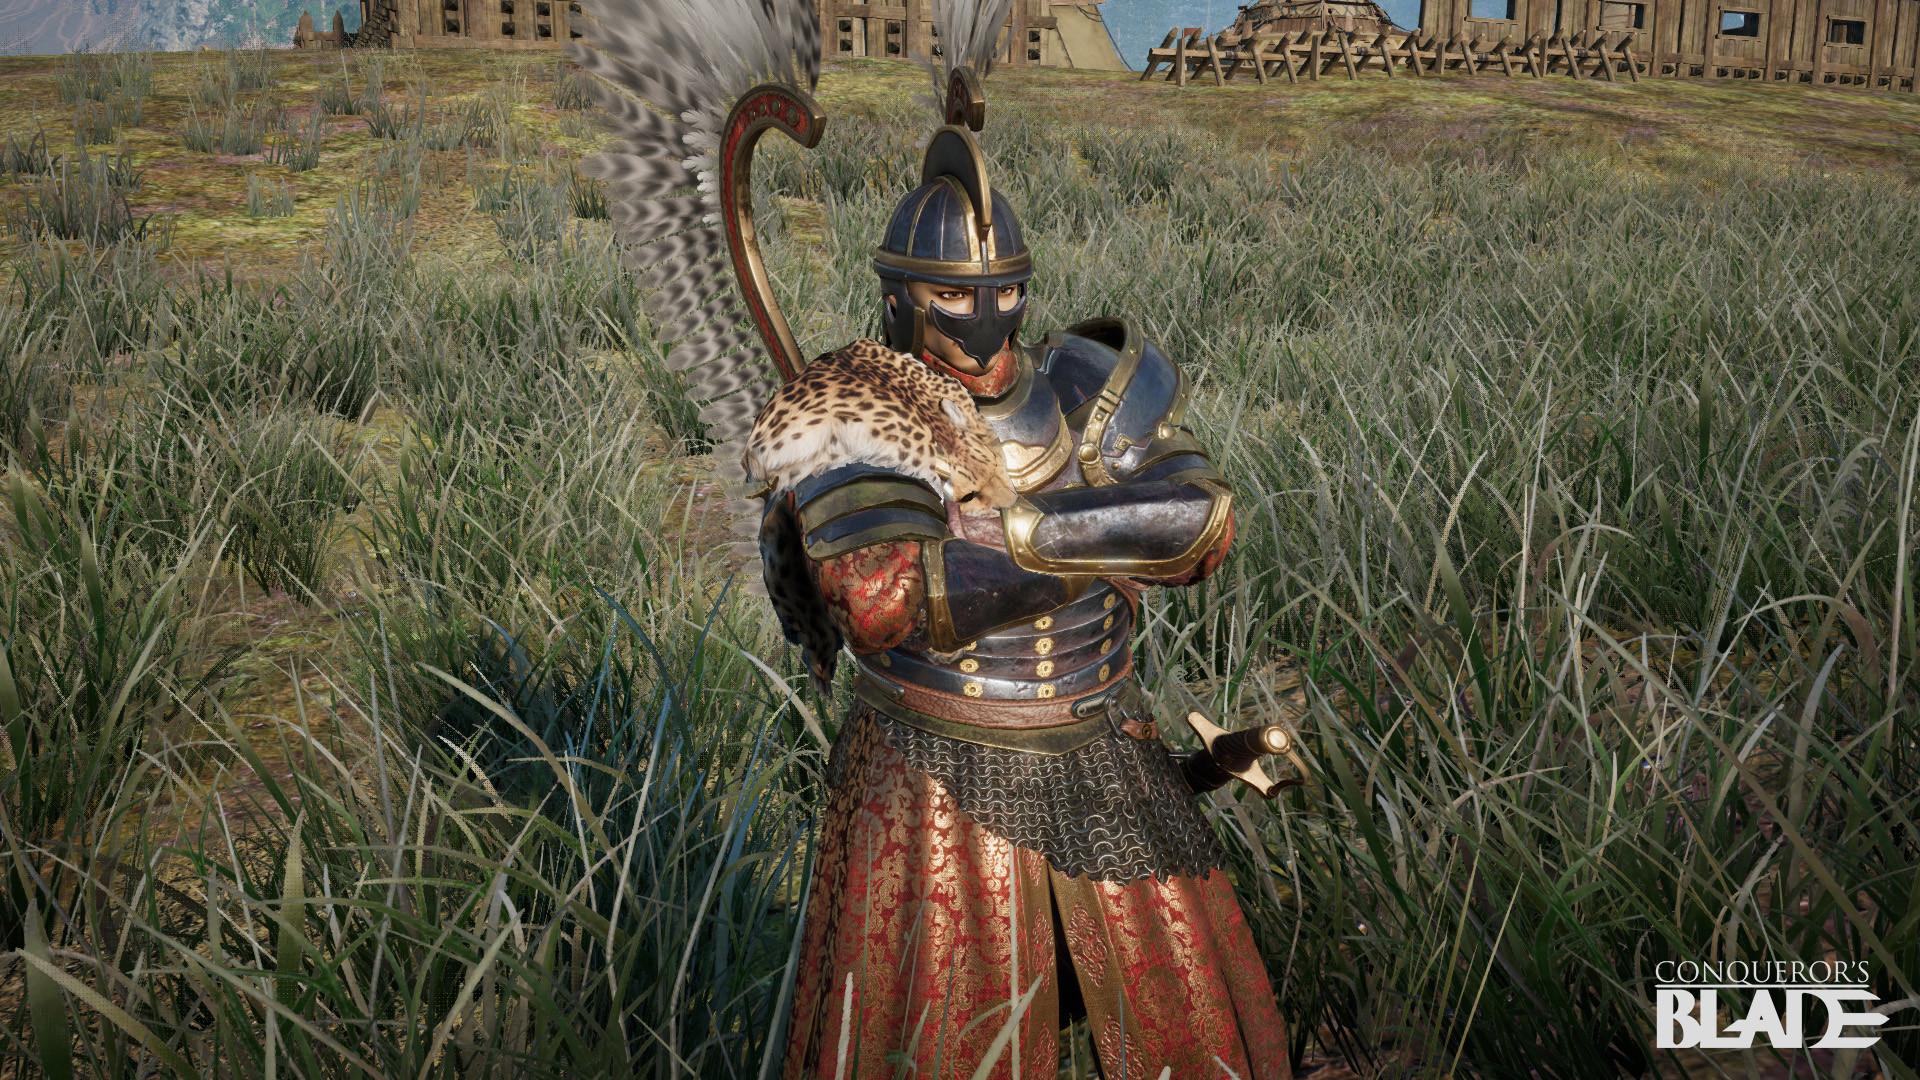 Conqueror's Blade - Hussar Hero Collector's Pack